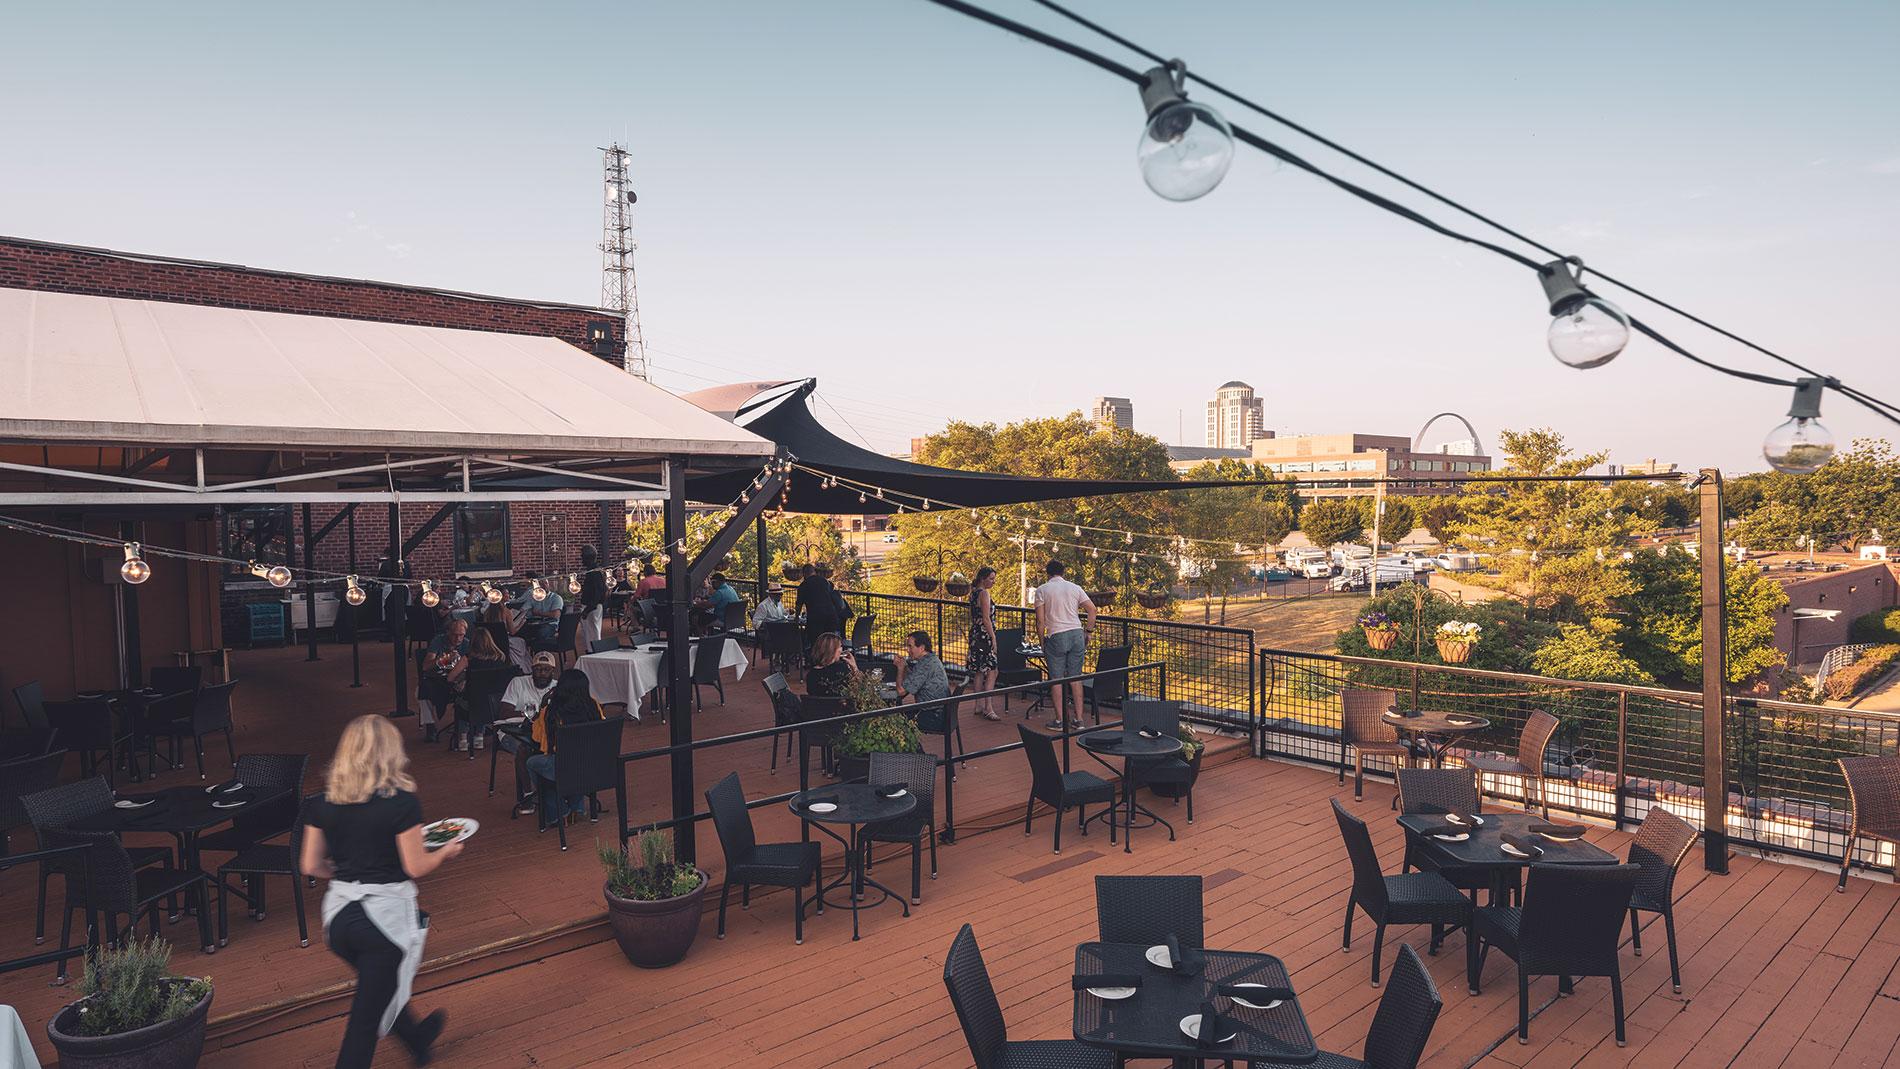 7 Readers' Choice Award-winning St. Louis patios